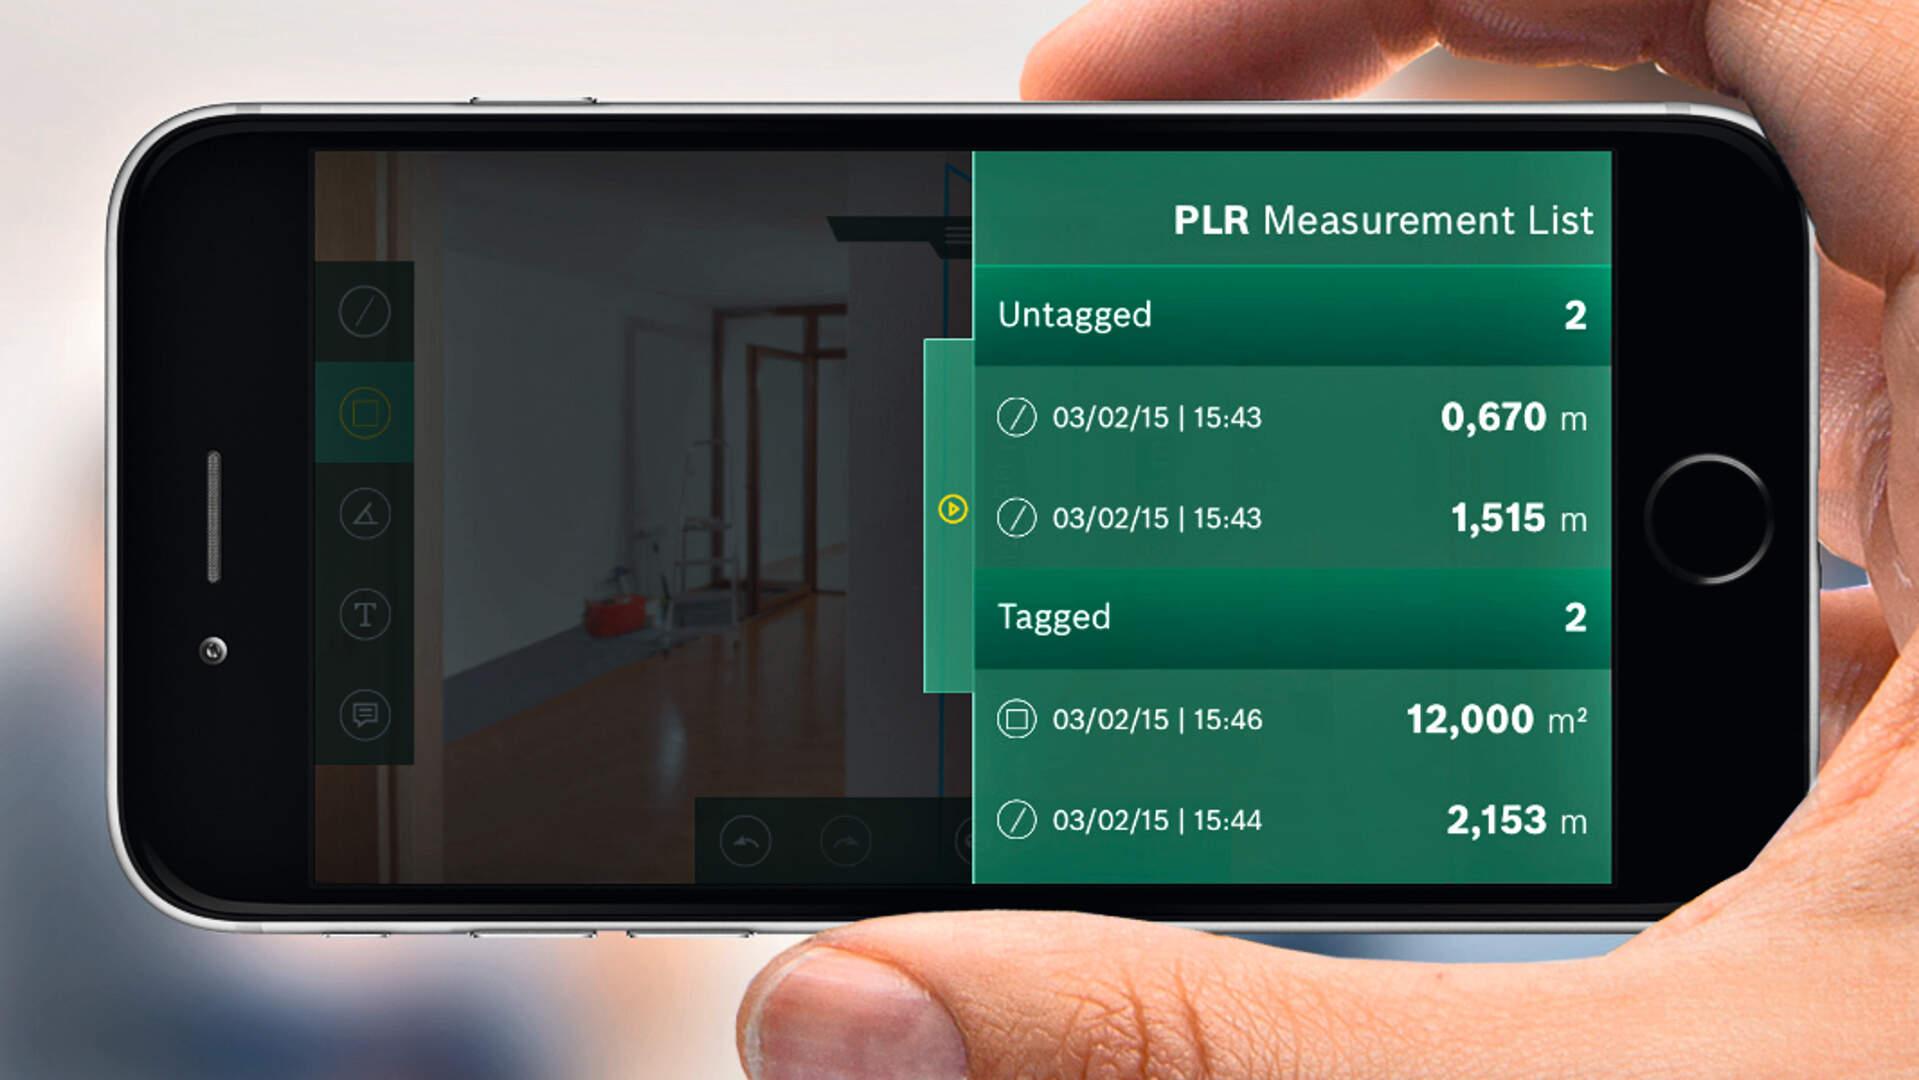 Bosch Entfernungsmesser App : Entfernungsmesser bluetooth test bosch plr c laser